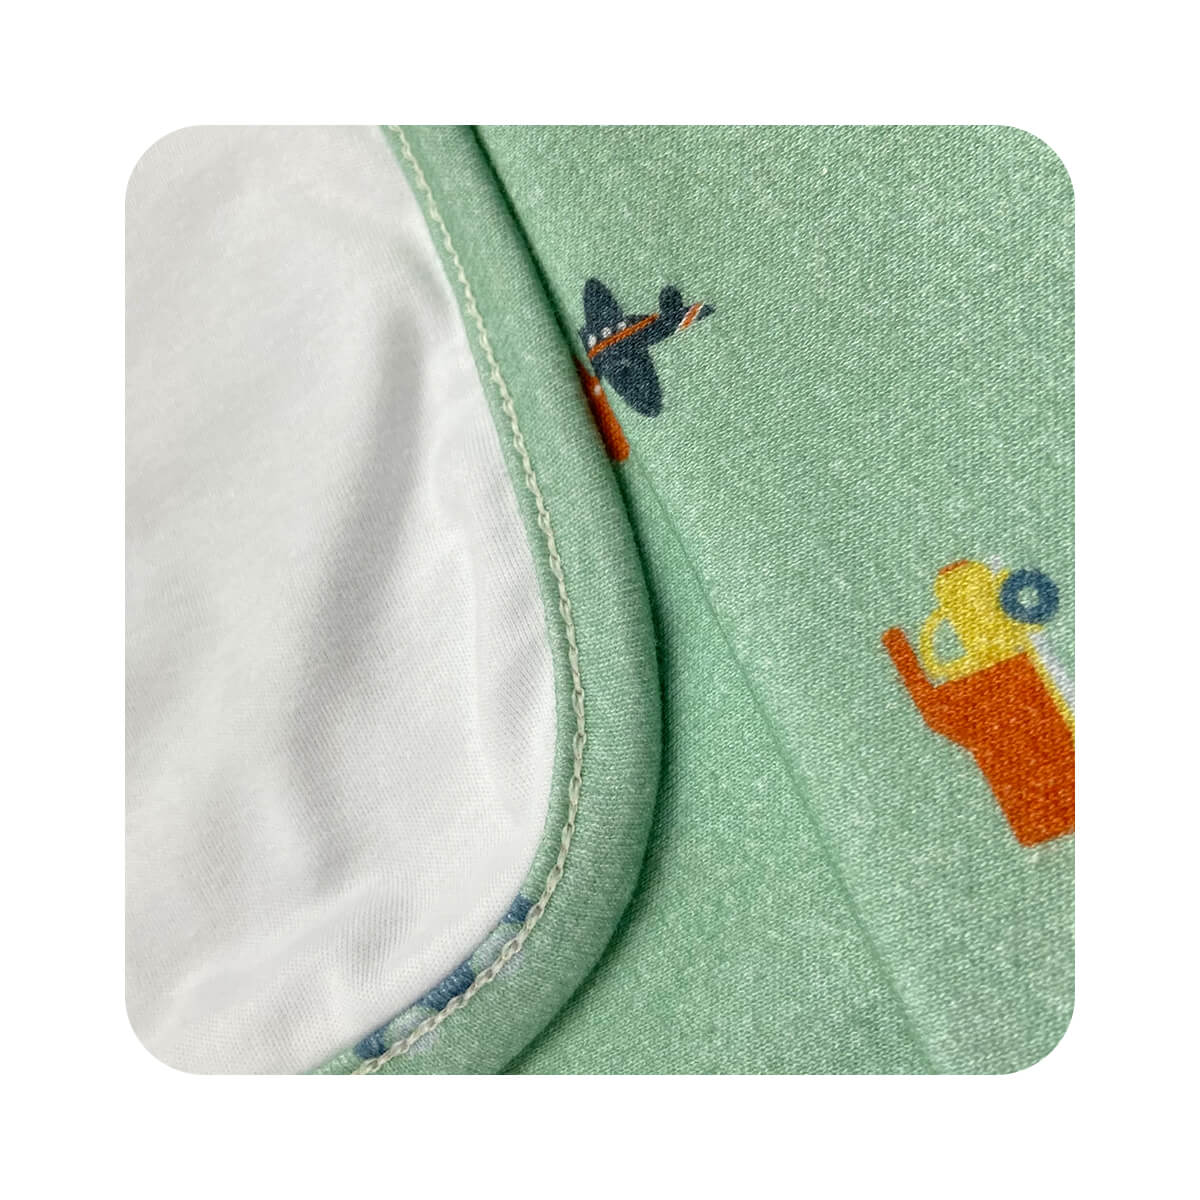 Kit Bebê Conforto Transportes  - Piu Blu